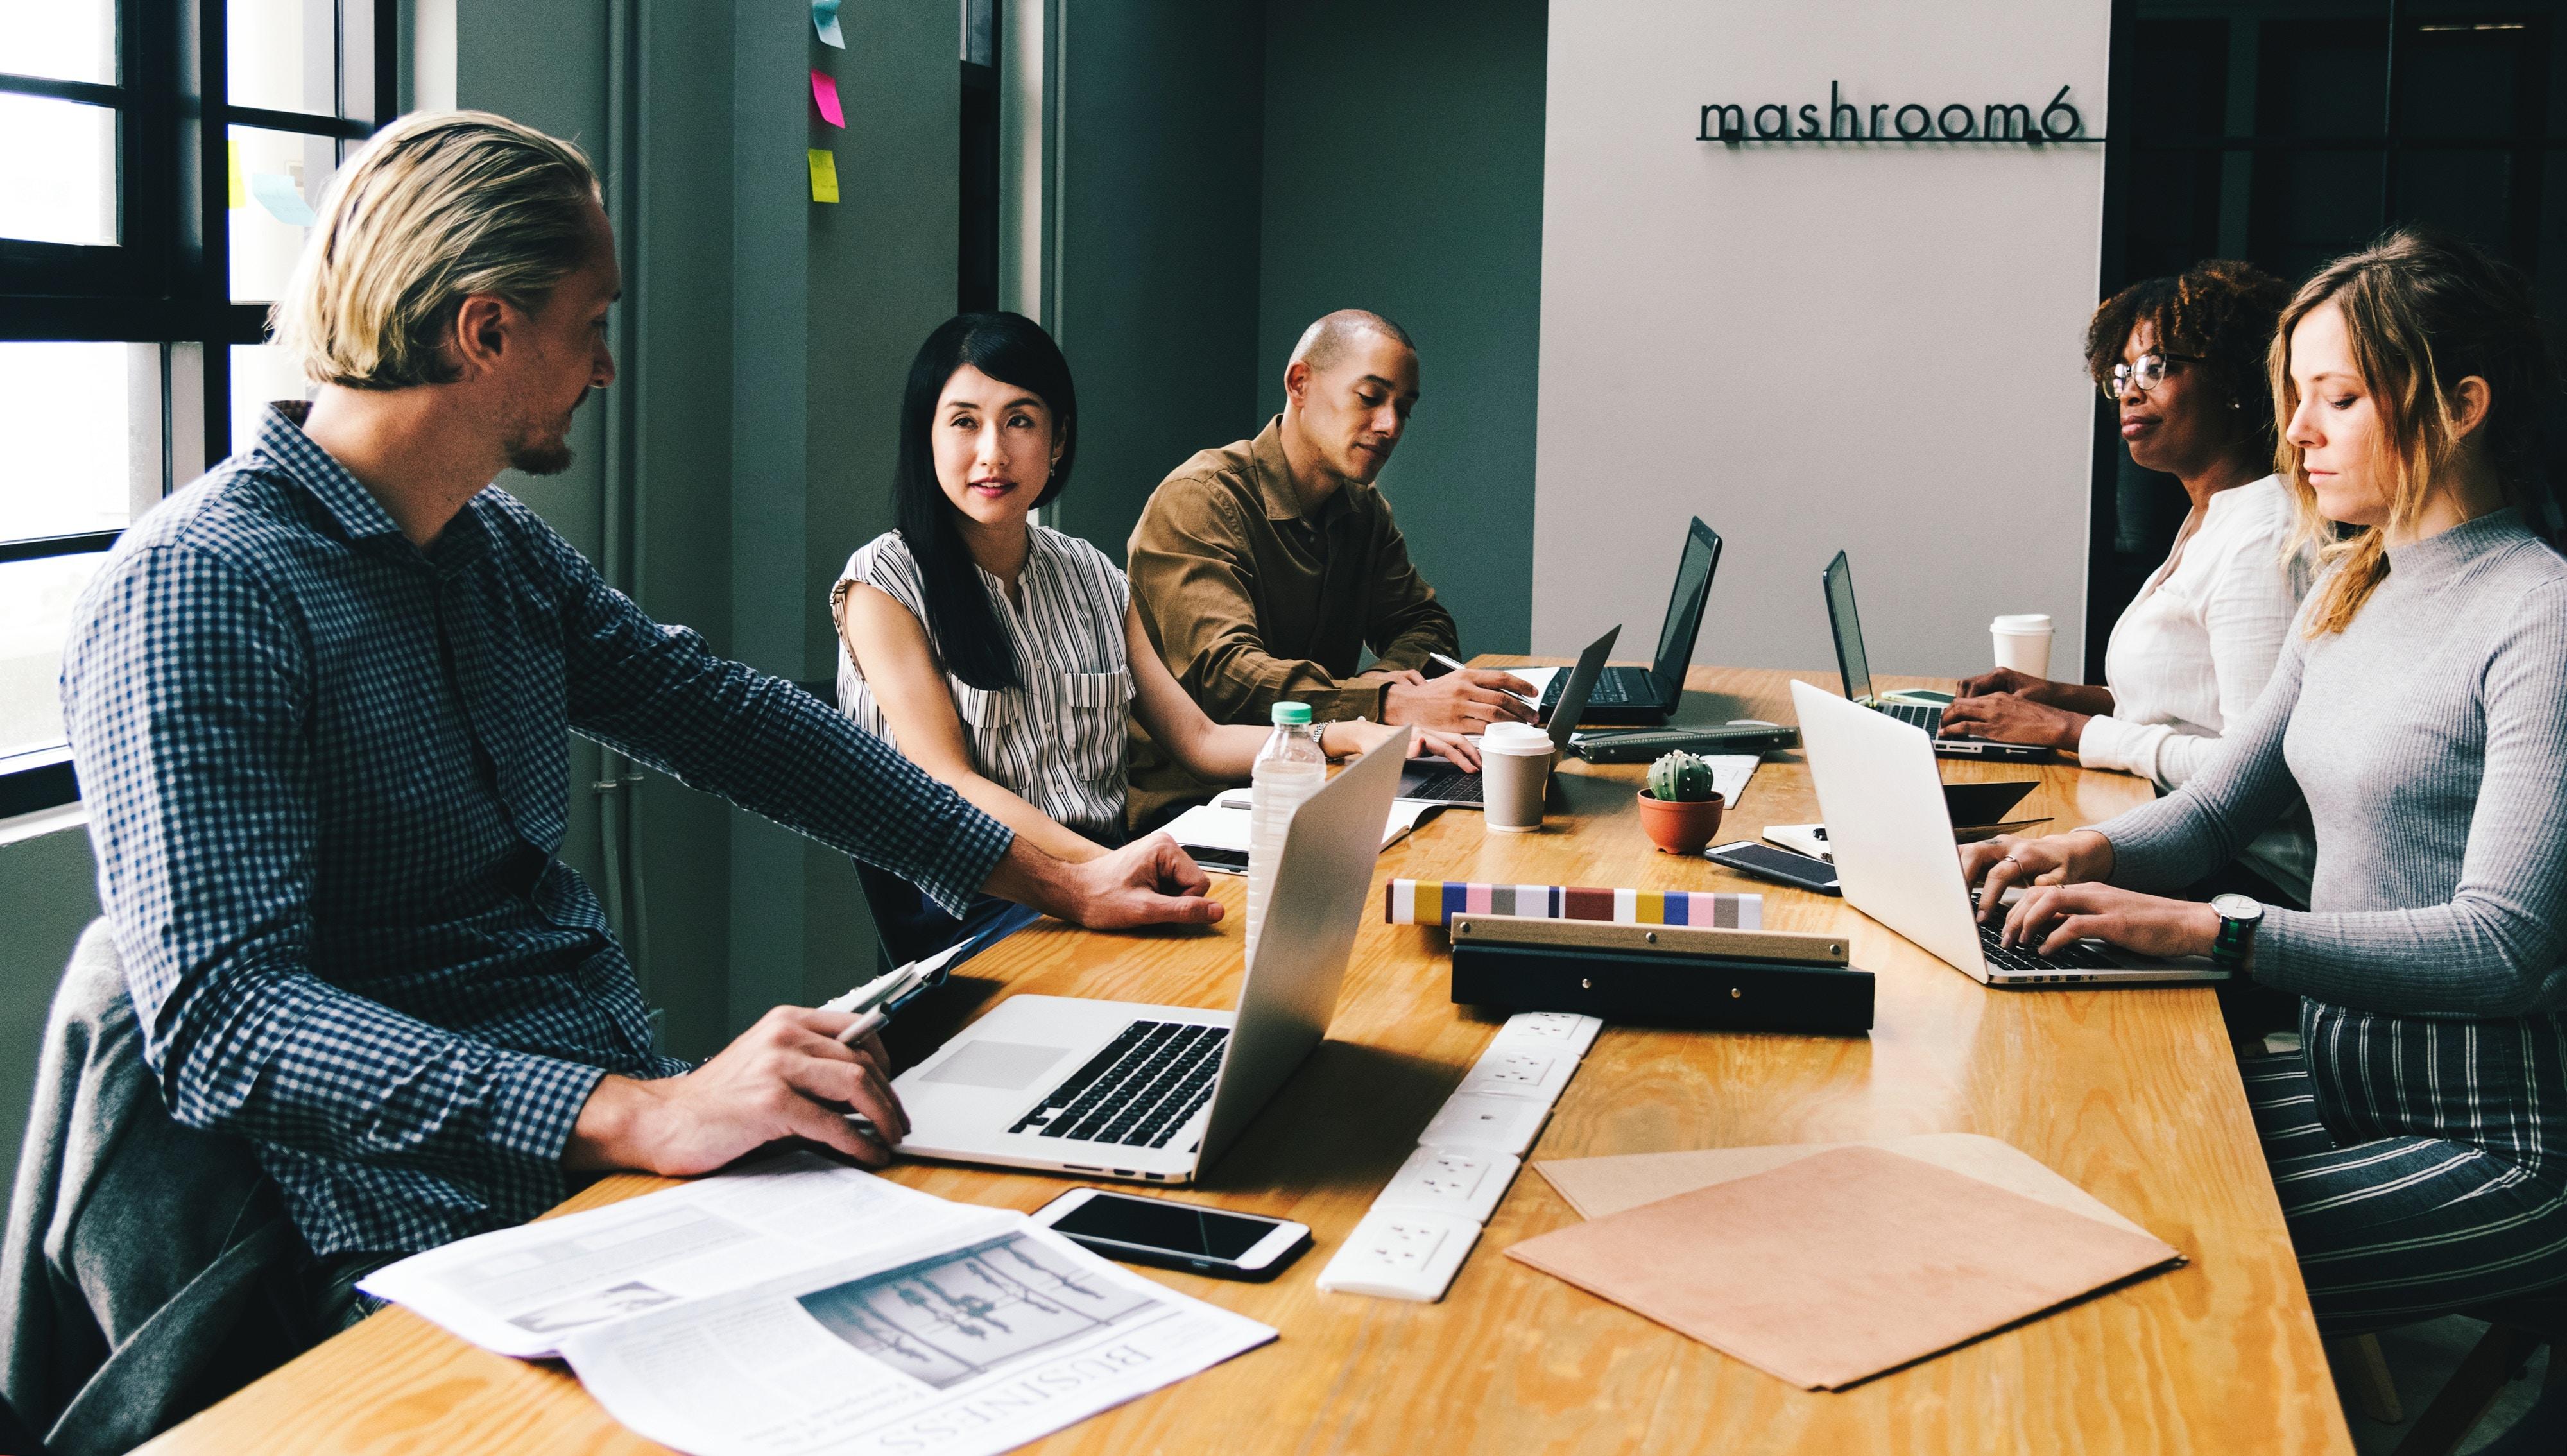 people working on desk